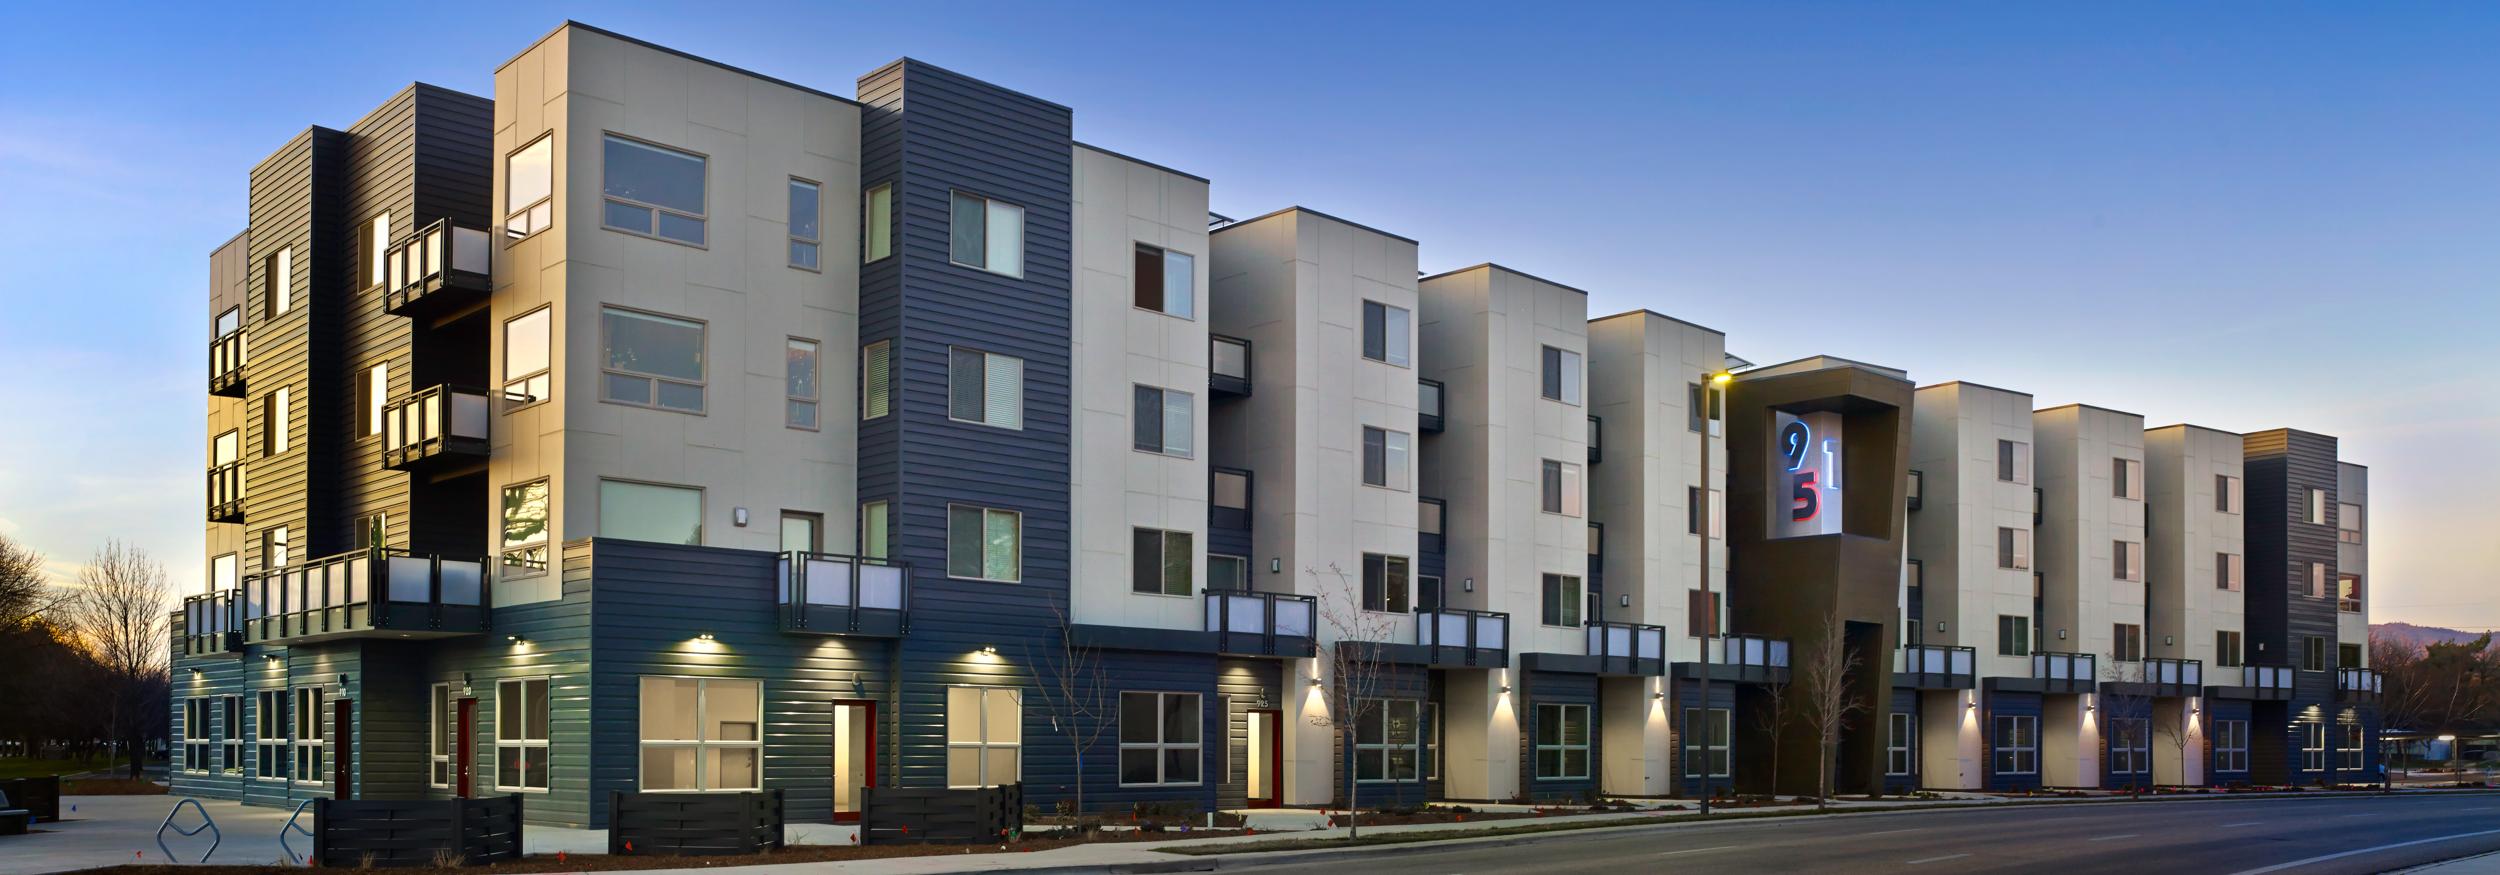 951 Apartments